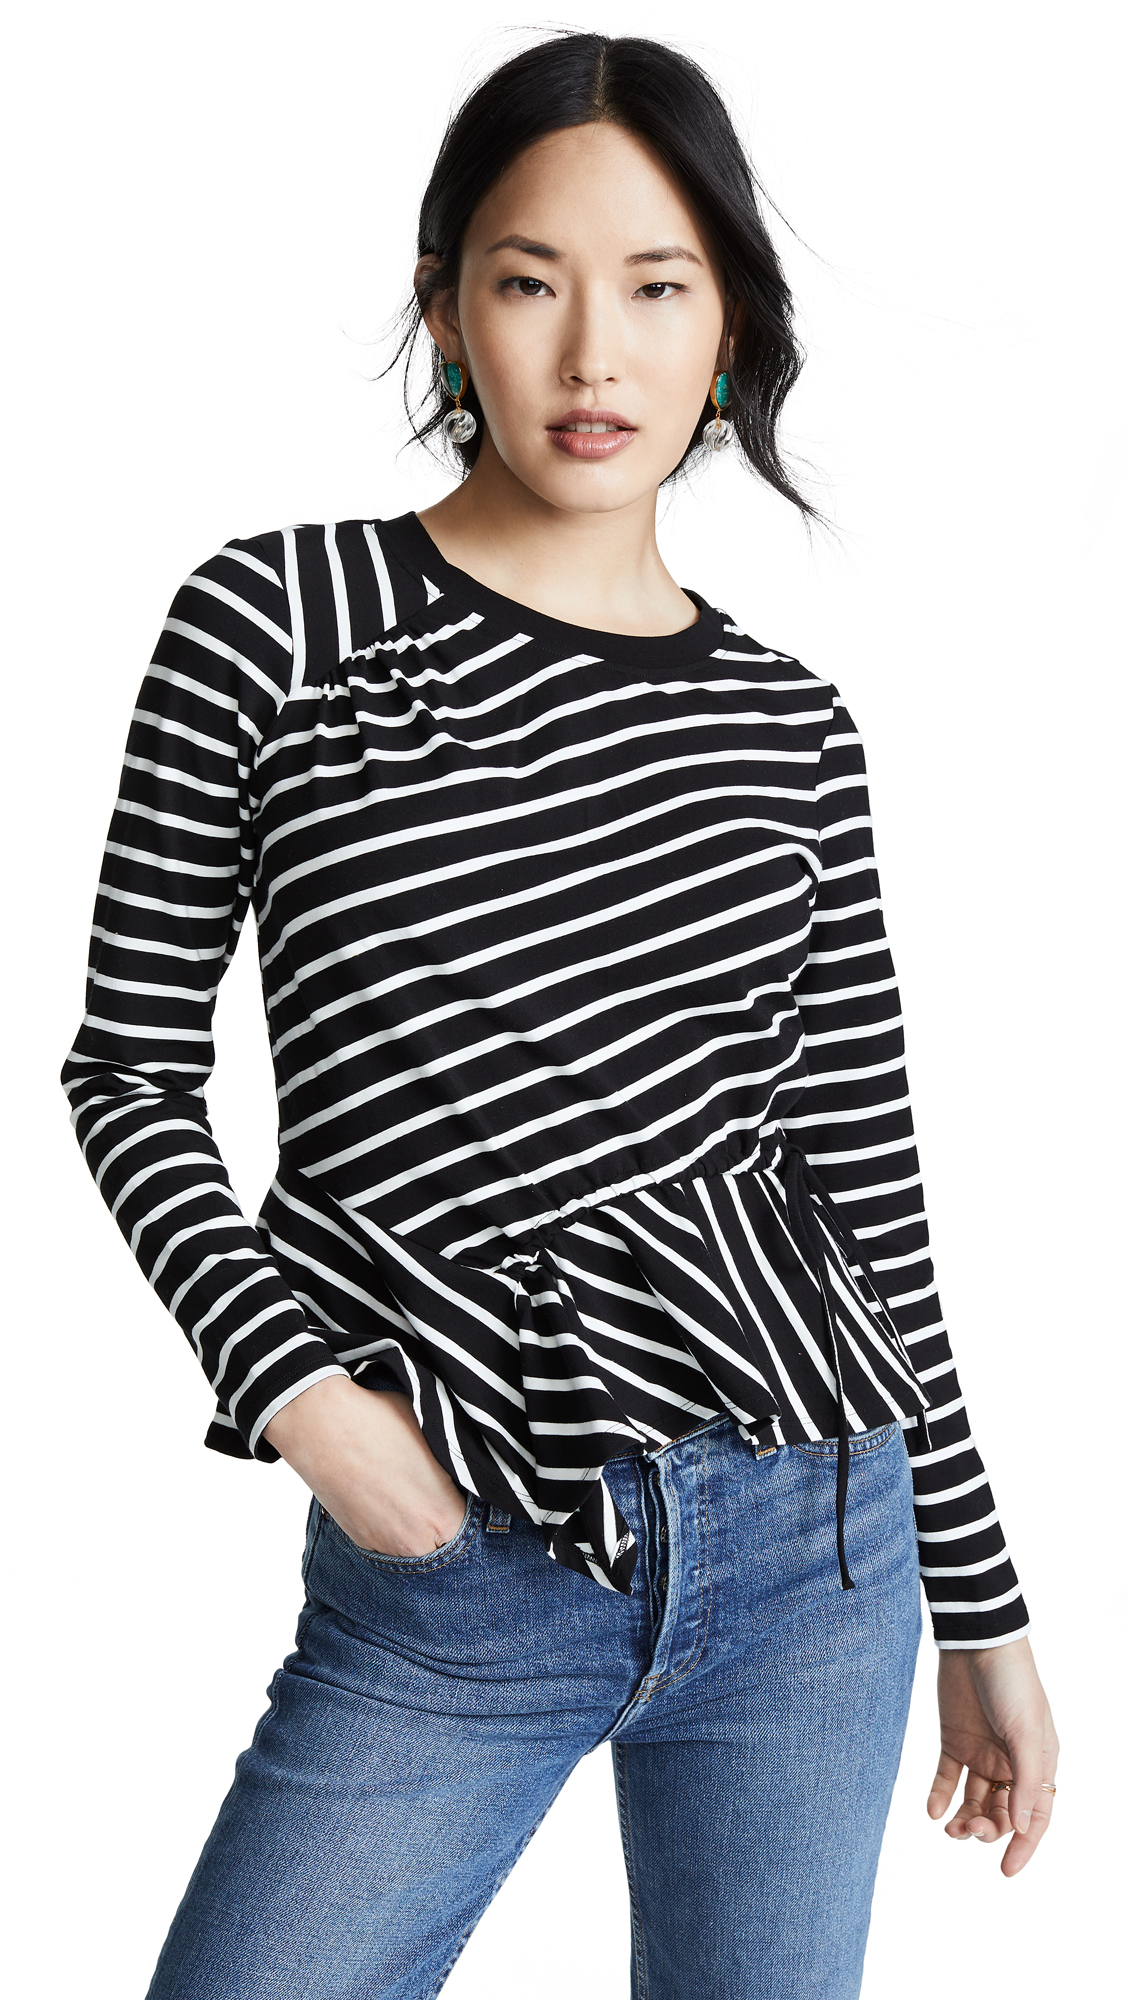 Parker Weekend Farris Top - Black/White Stripe